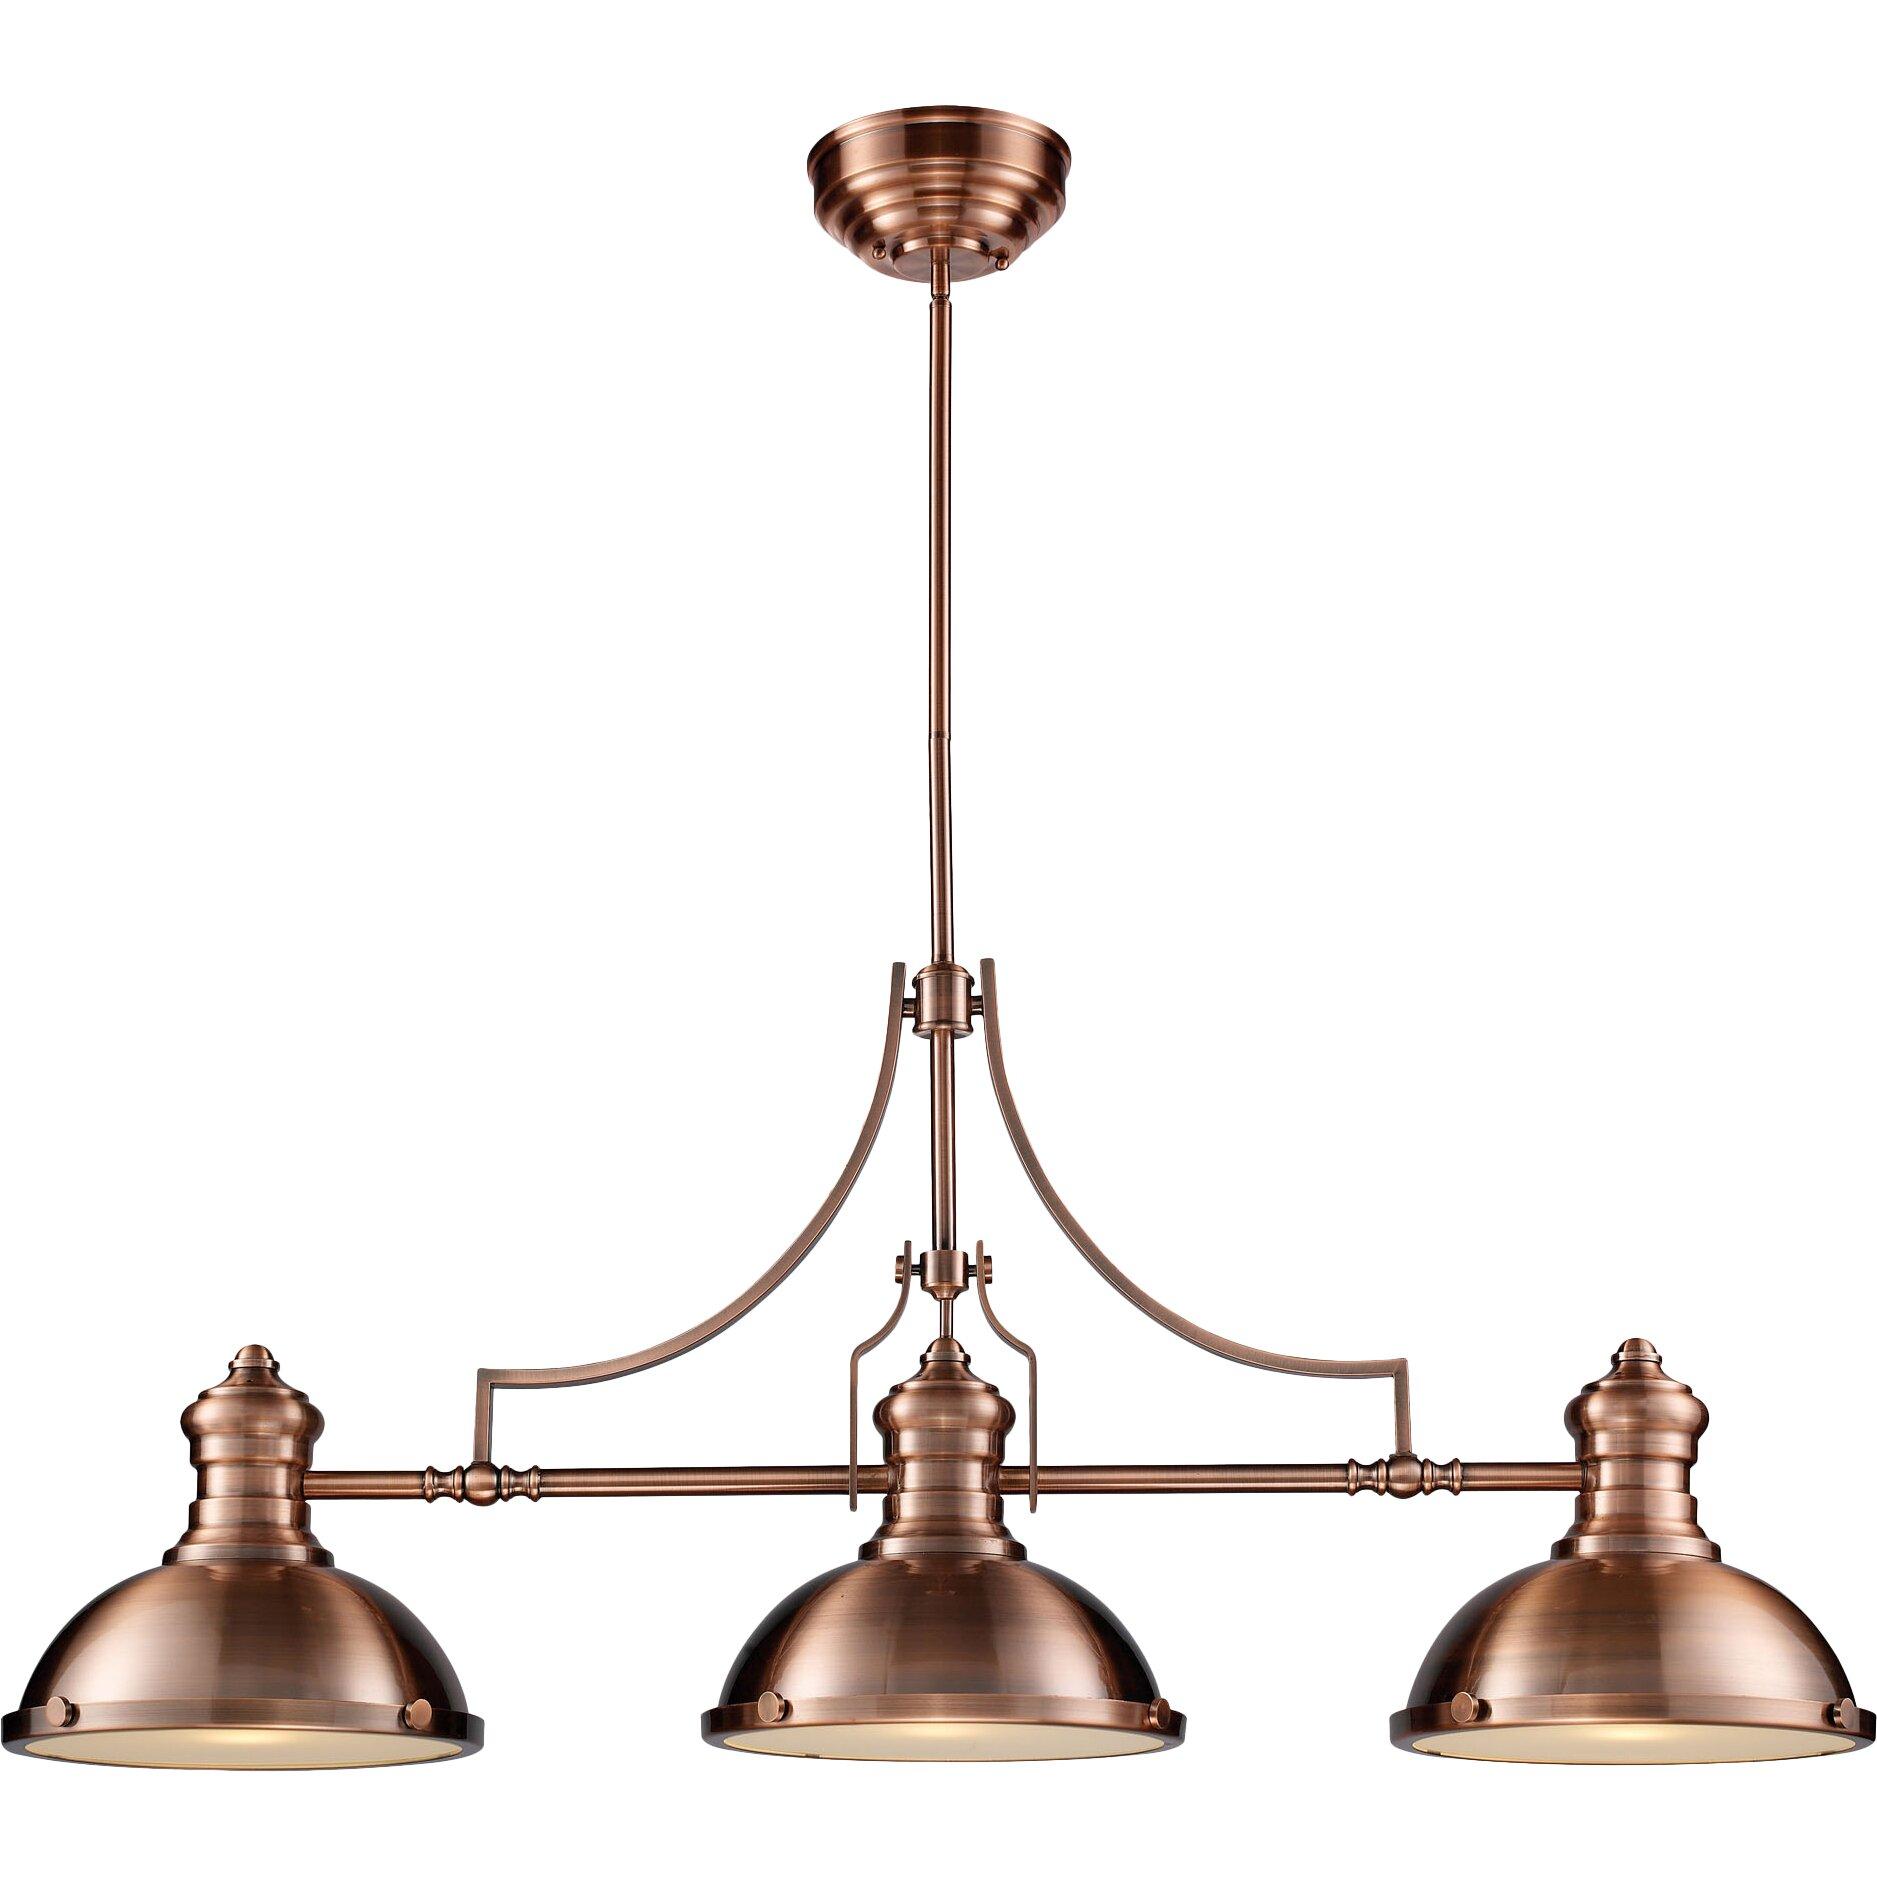 Elk Lighting Chadwick 3 Light Pool Table Light & Reviews